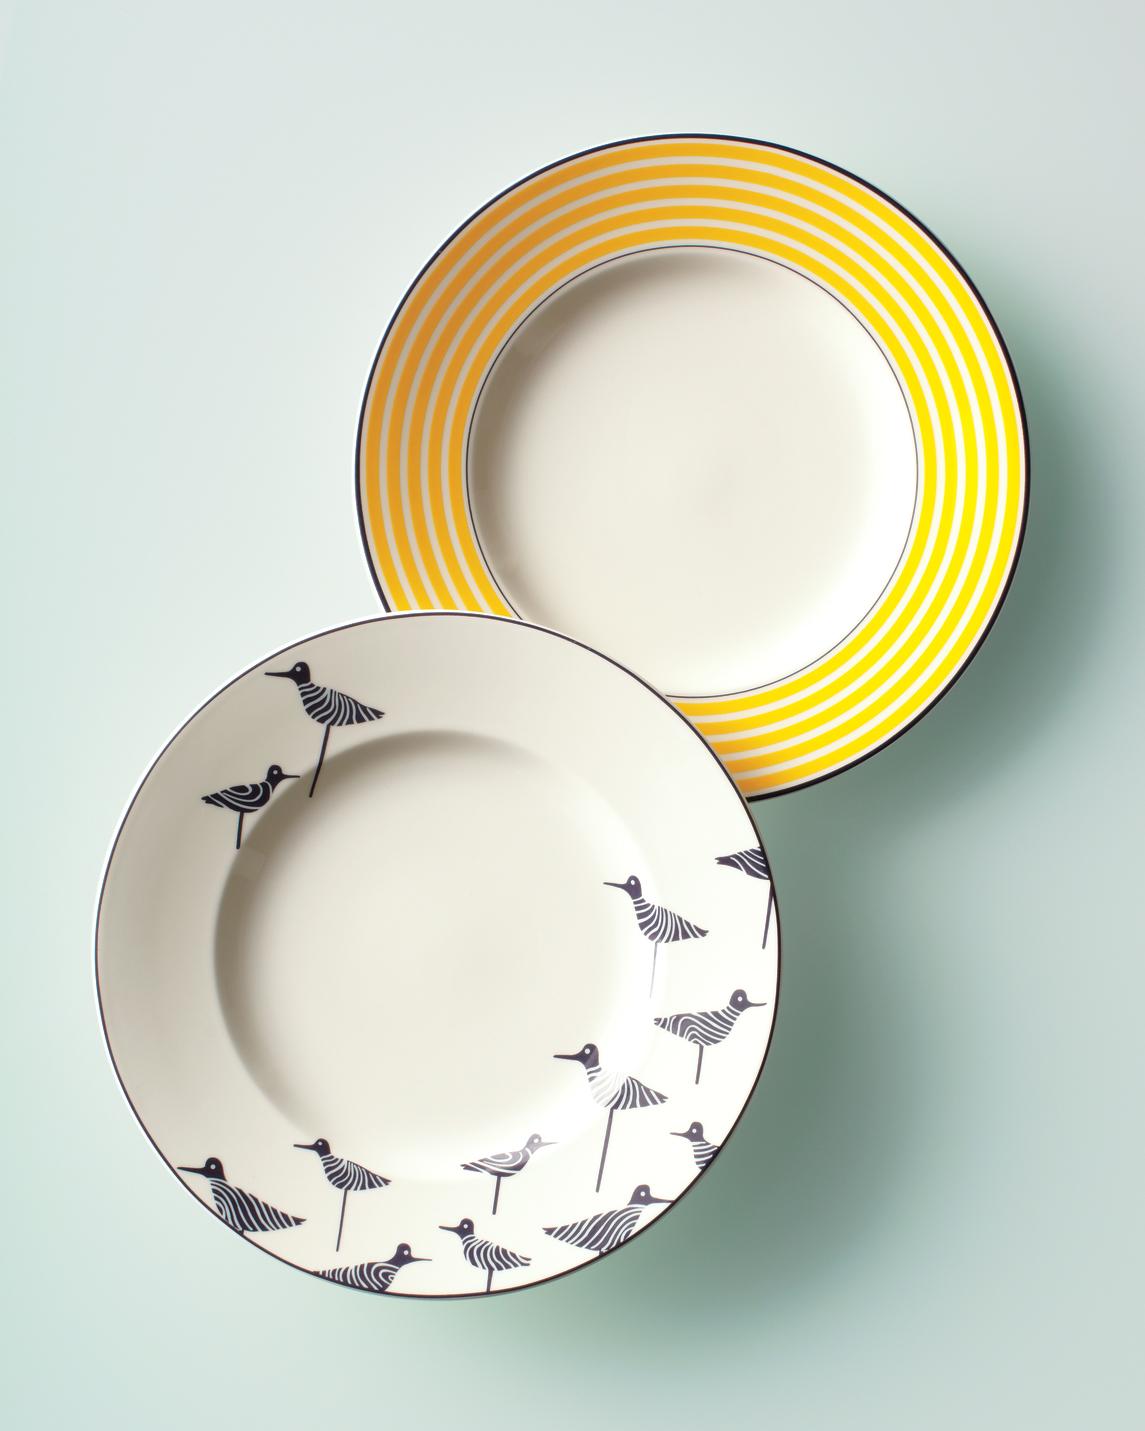 plates-mwd108267.jpg